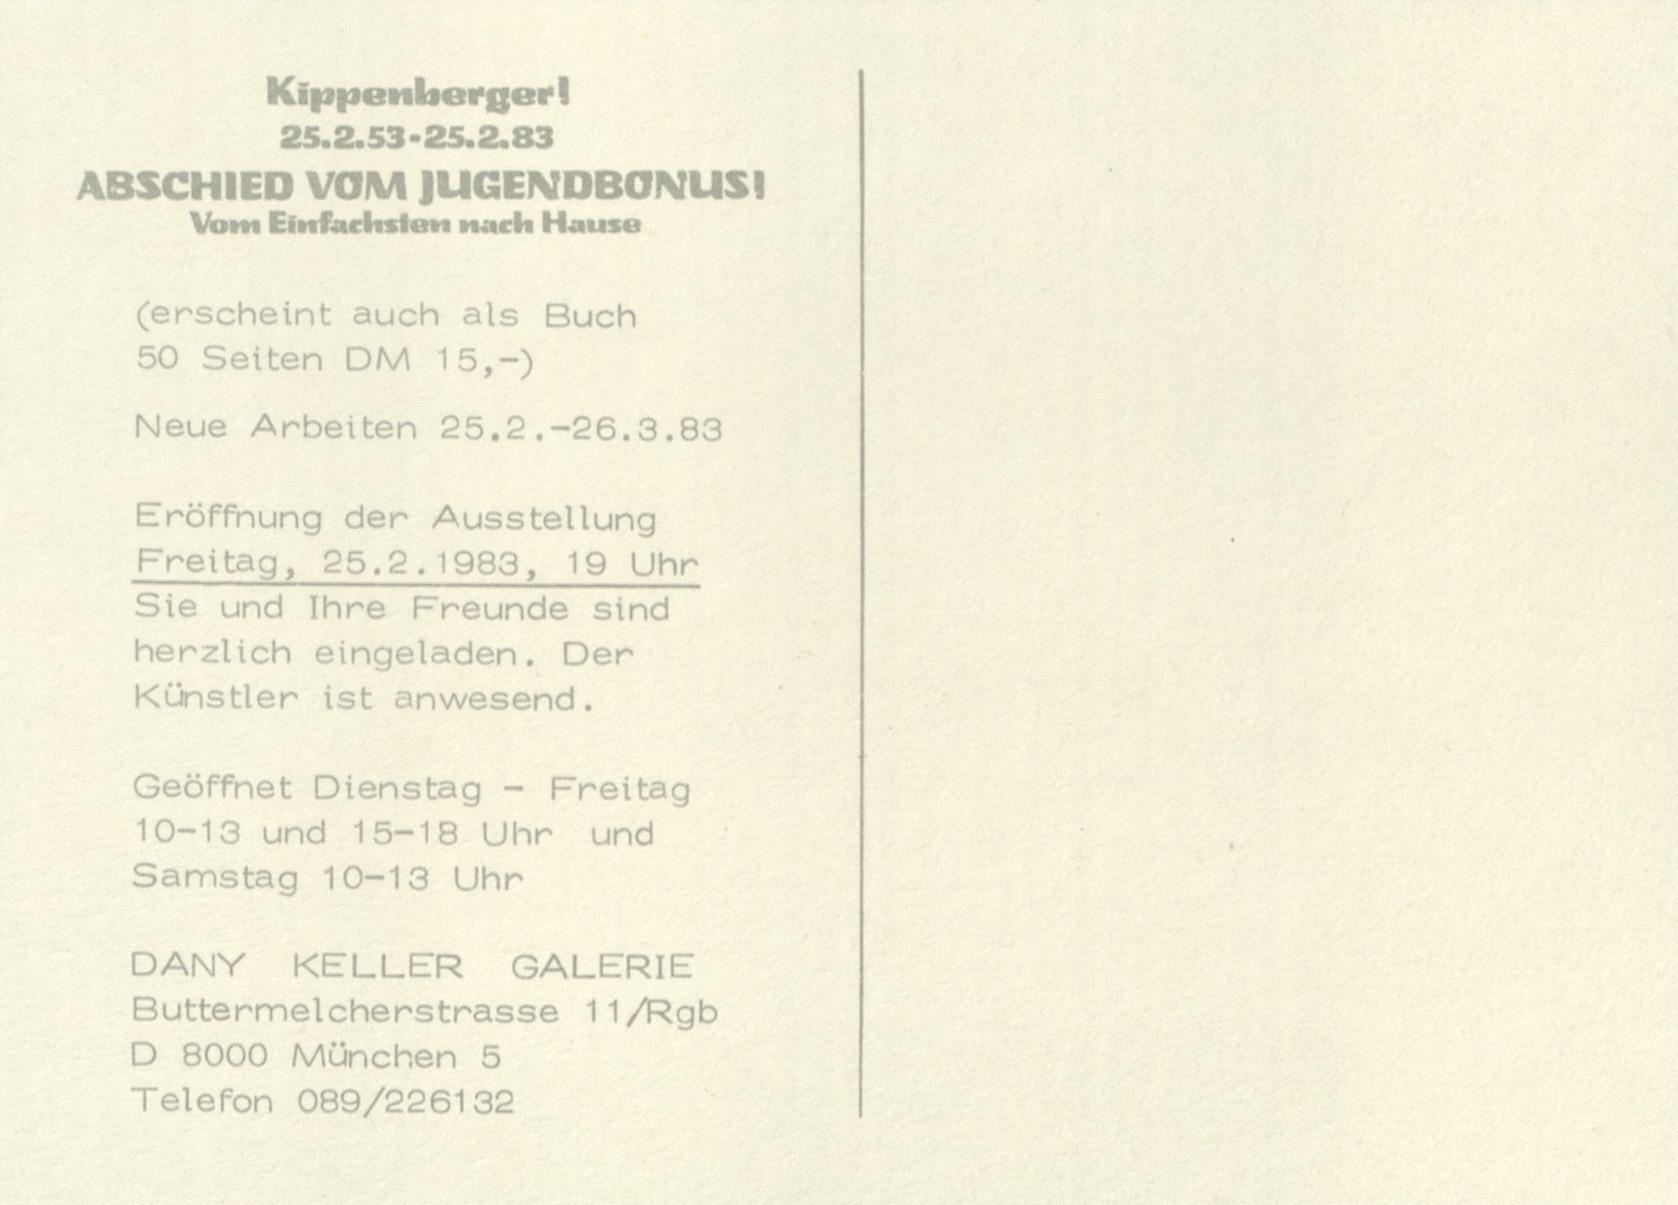 Martin Kippenberger, ABSCHIED VOM JUGENDBONUS 1, Danny Keller, München 1981 (Invitation Card) © 2019 Estate Martin Kippenberger, Galerie Gisela Capitain, Cologne; Archiv der Avantgarden, Staatliche Kunstsamllungen Dresden